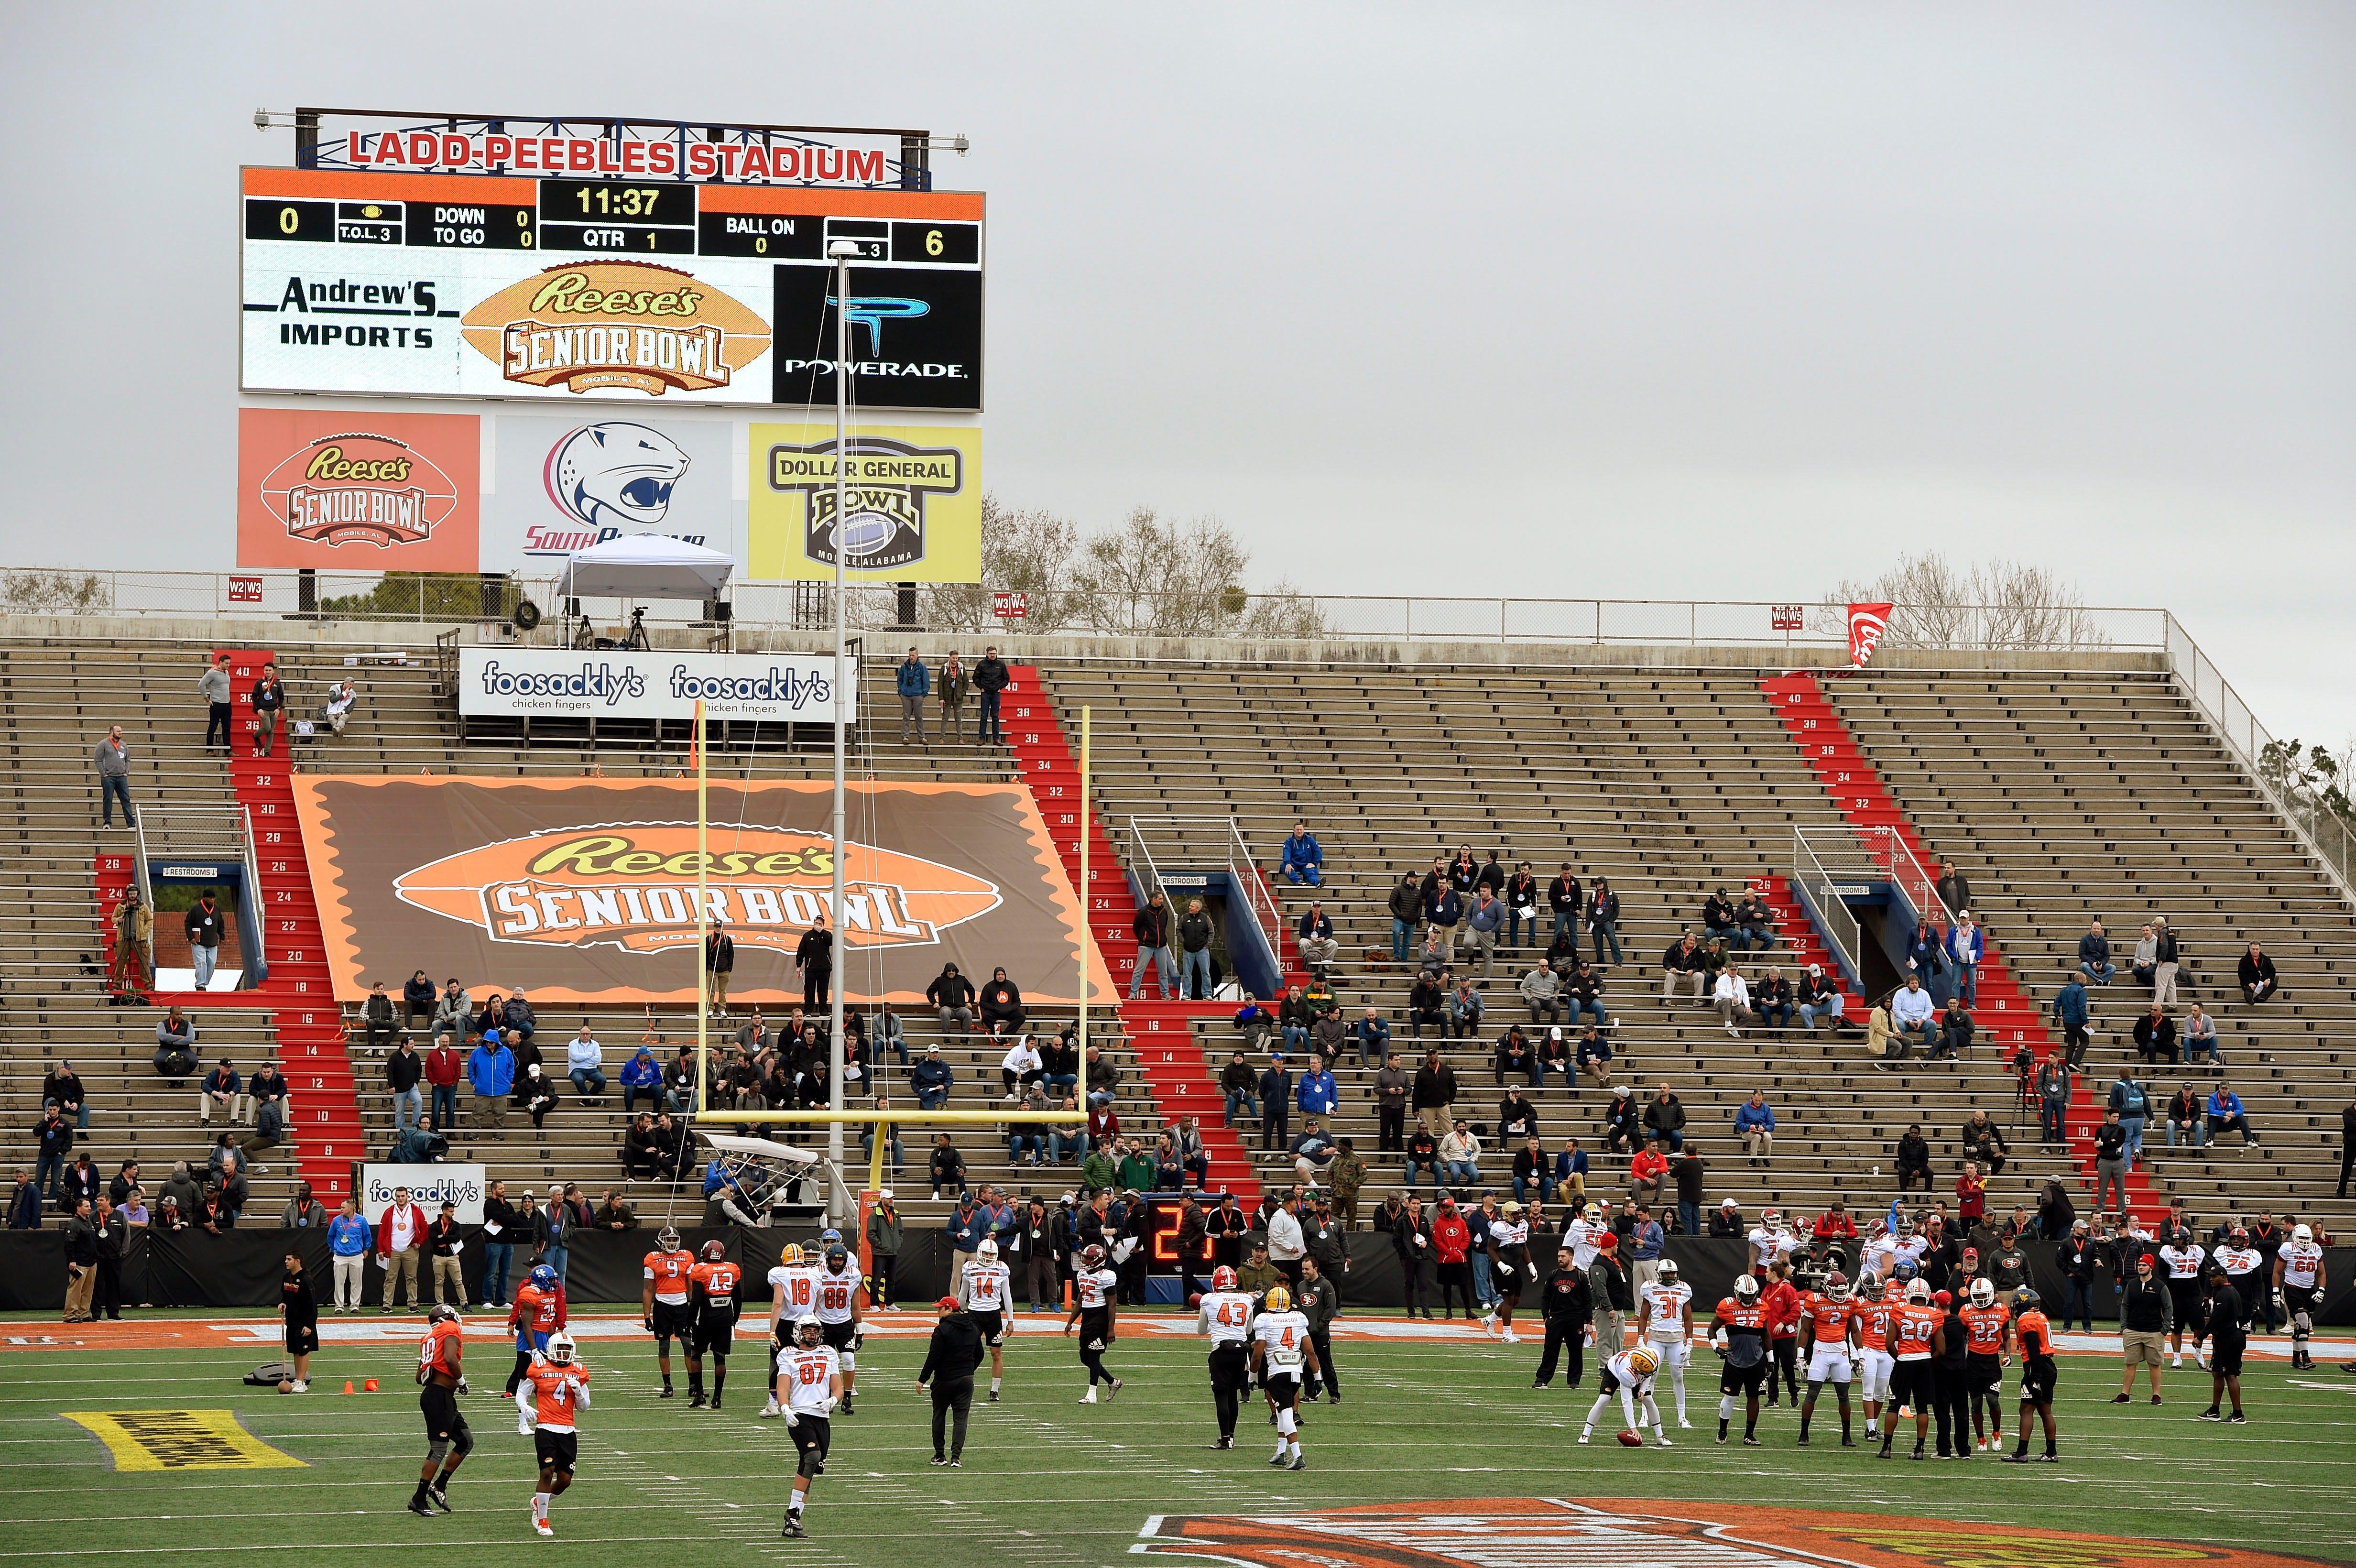 South squad runs through drills during the Senior Bowl practice at Ladd-Peebles Stadium.